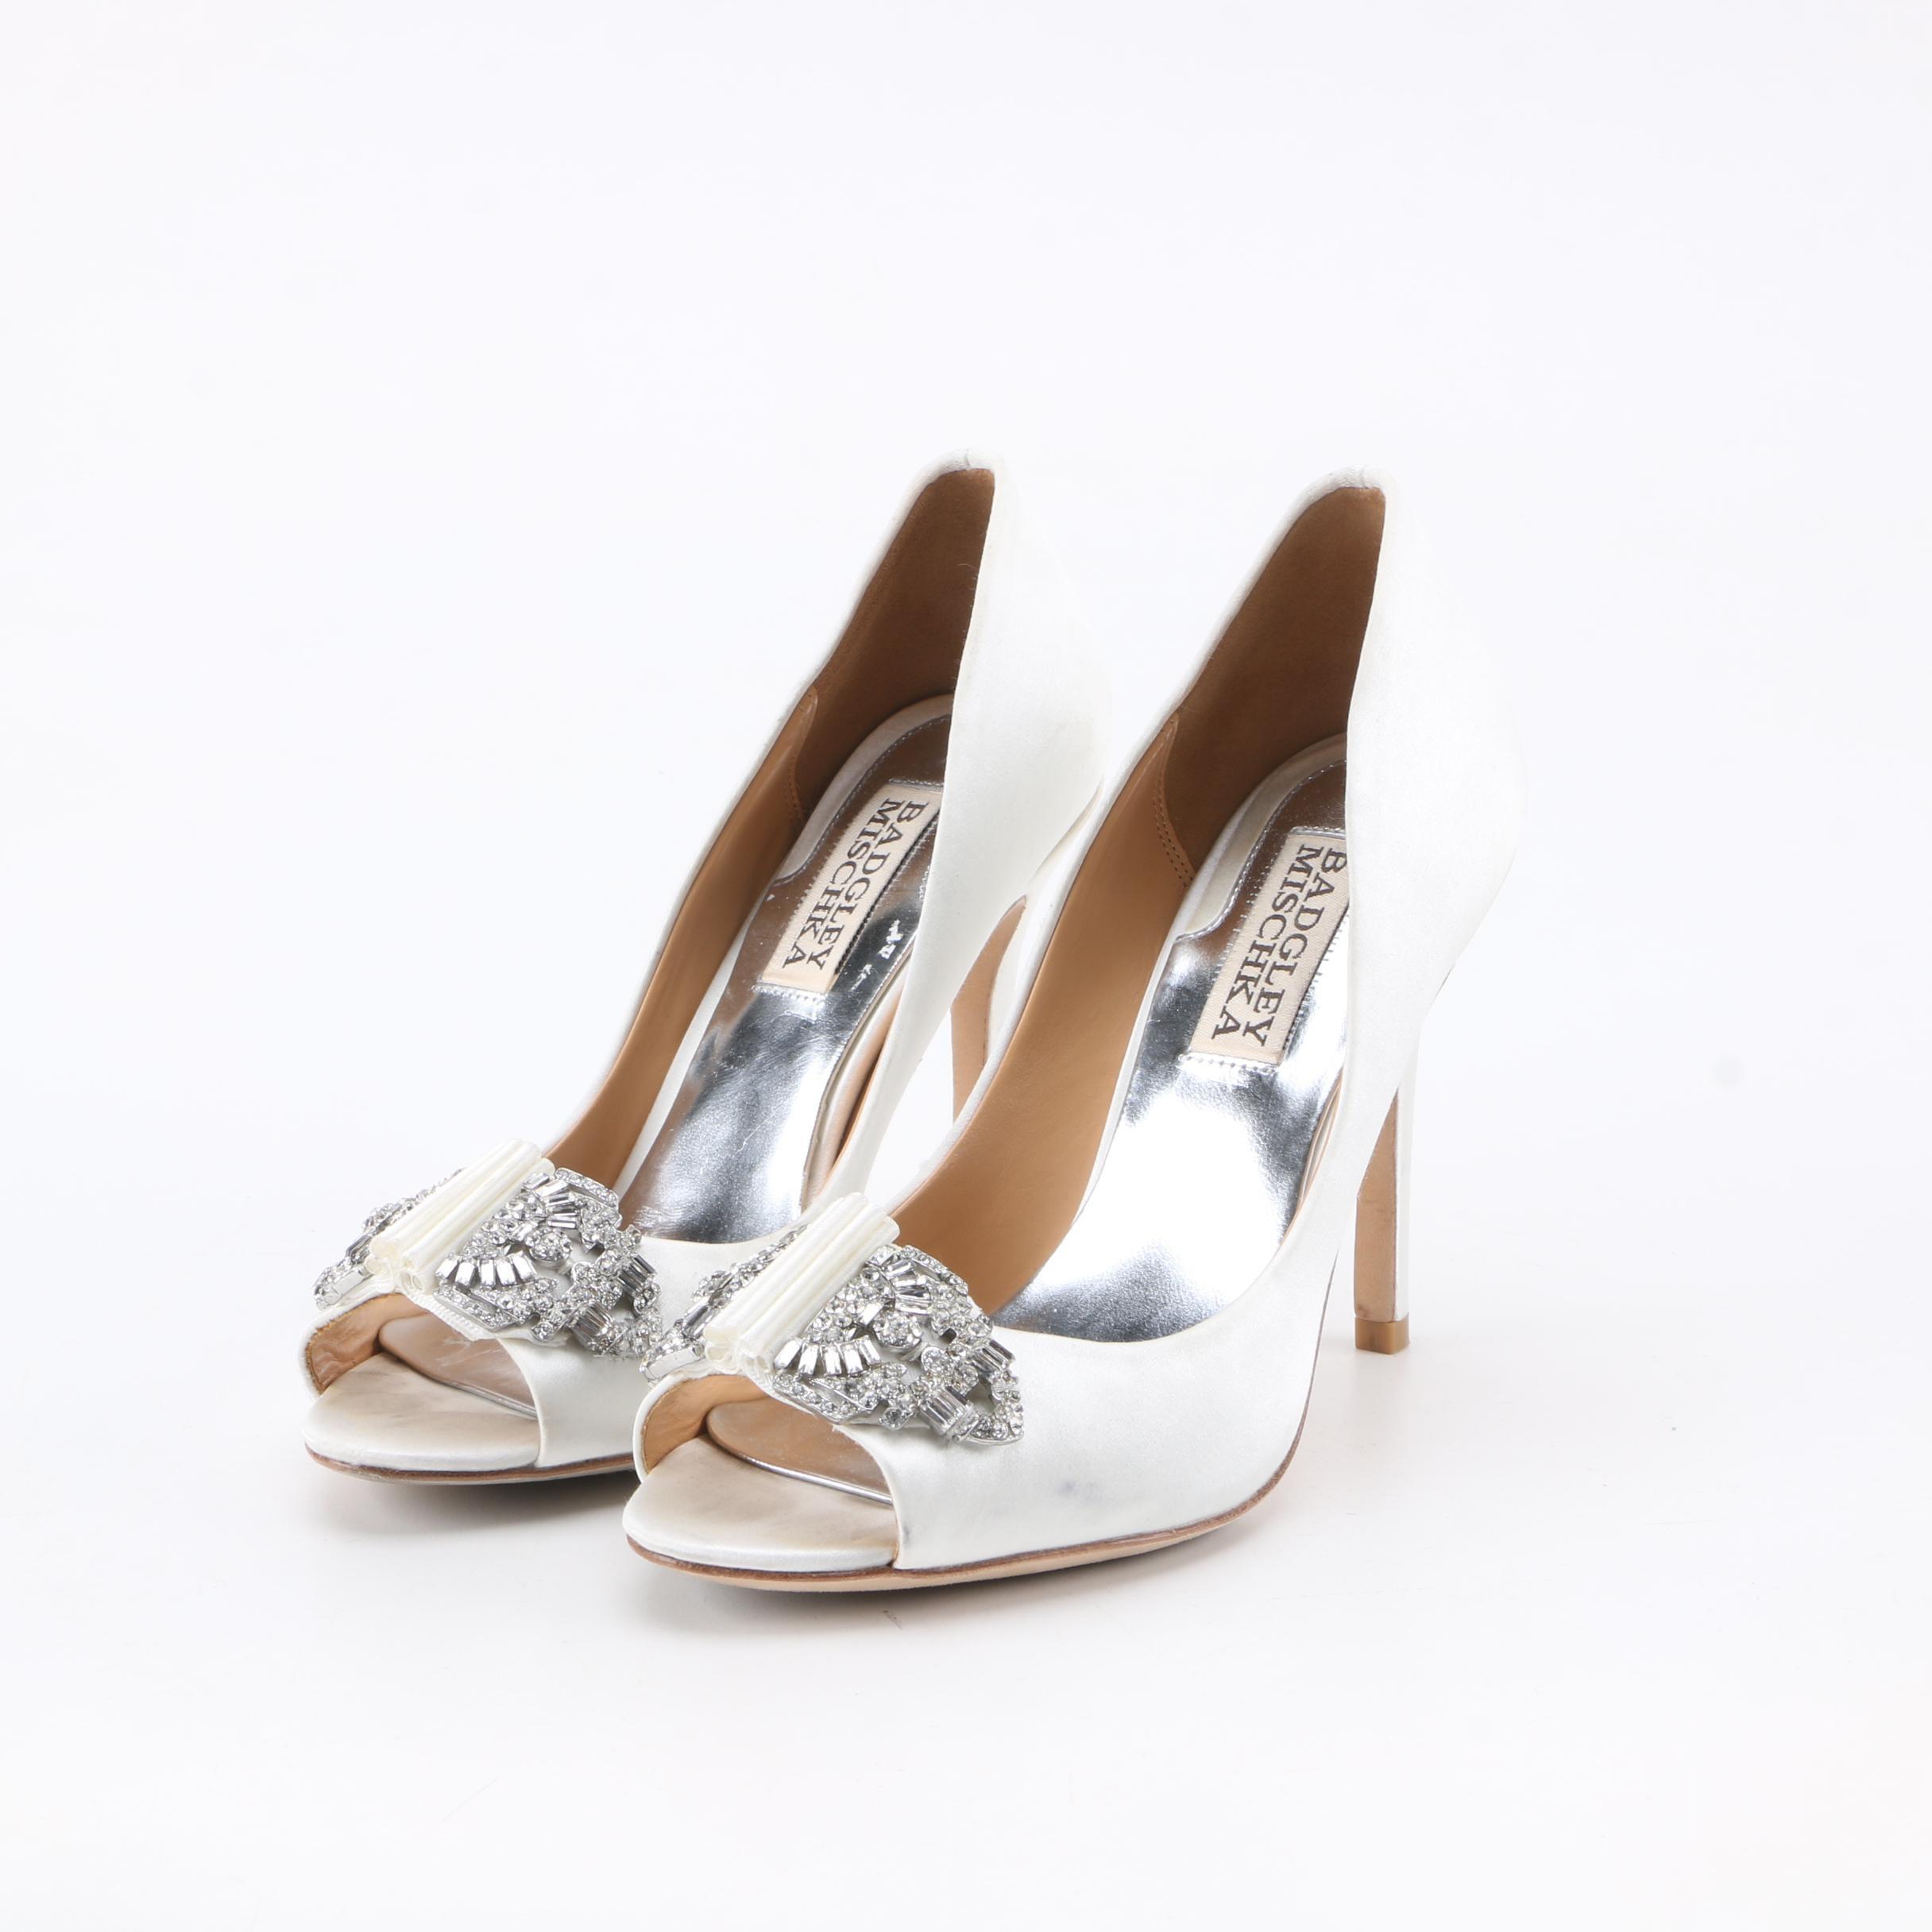 Badgley Mischka White Satin Peep-Toe High Heel Dress Pumps with Rhinestones